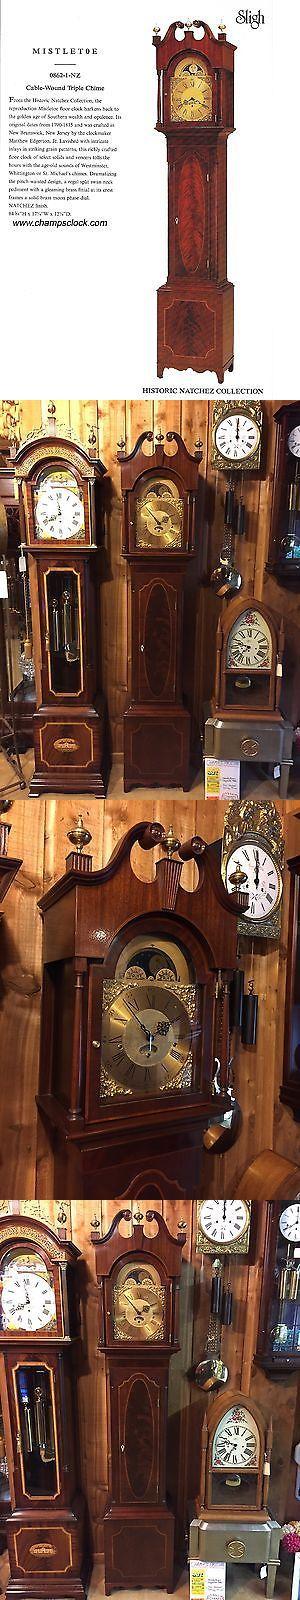 Grandfather Clocks 20559: Sligh 862-1Nz Mistletoe Natchez Collection Grandfather Clock Brand New #42 Of 62 -> BUY IT NOW ONLY: $5997 on eBay!